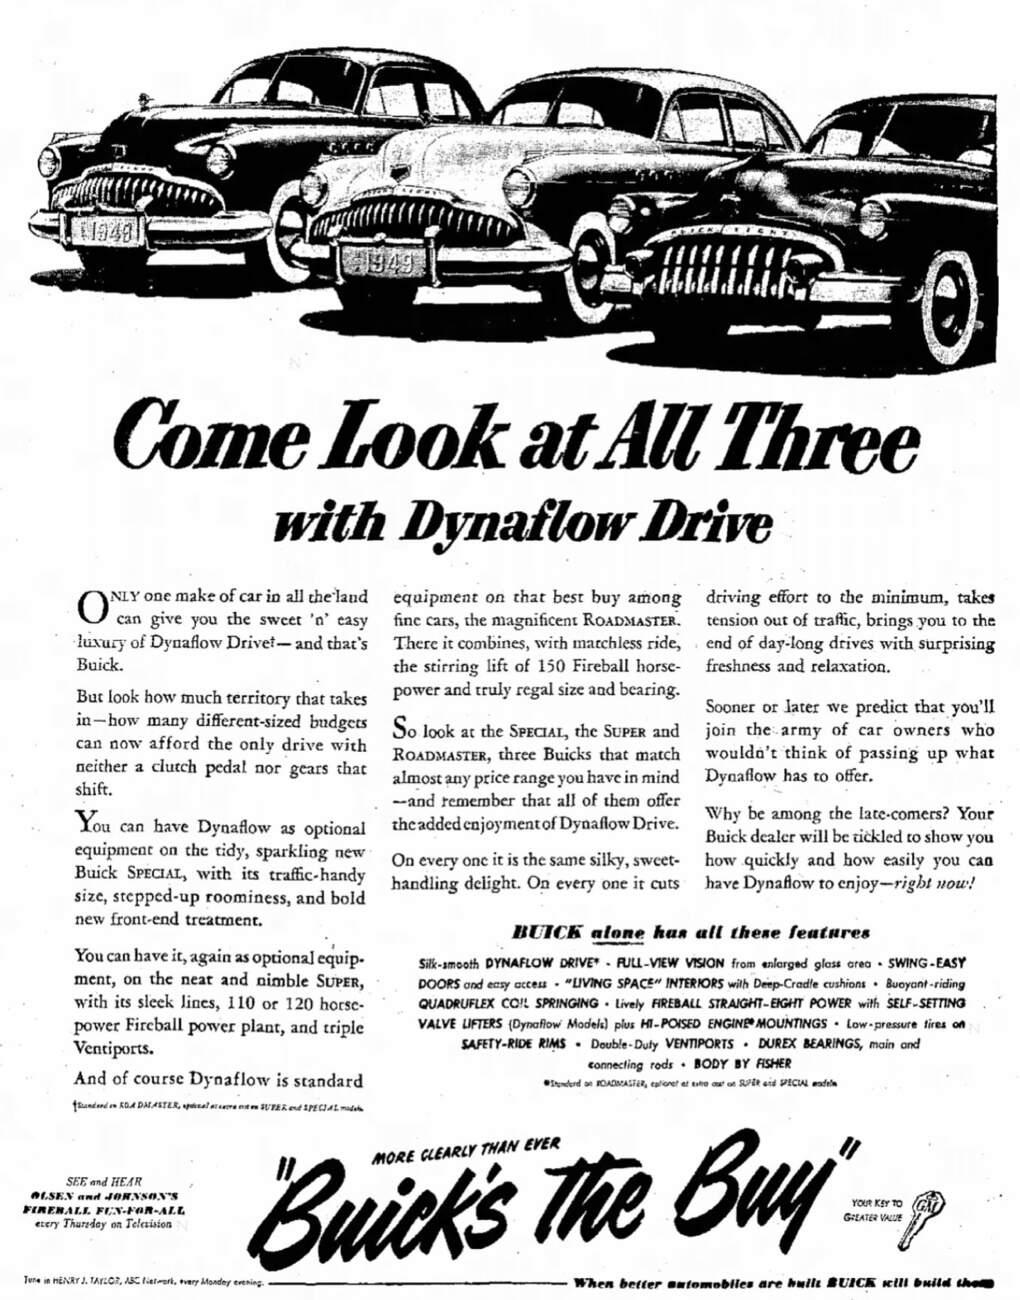 Buick advertisement in the Jefferson City Post-Trubune, Oct. 11, 1949, pg. 4.